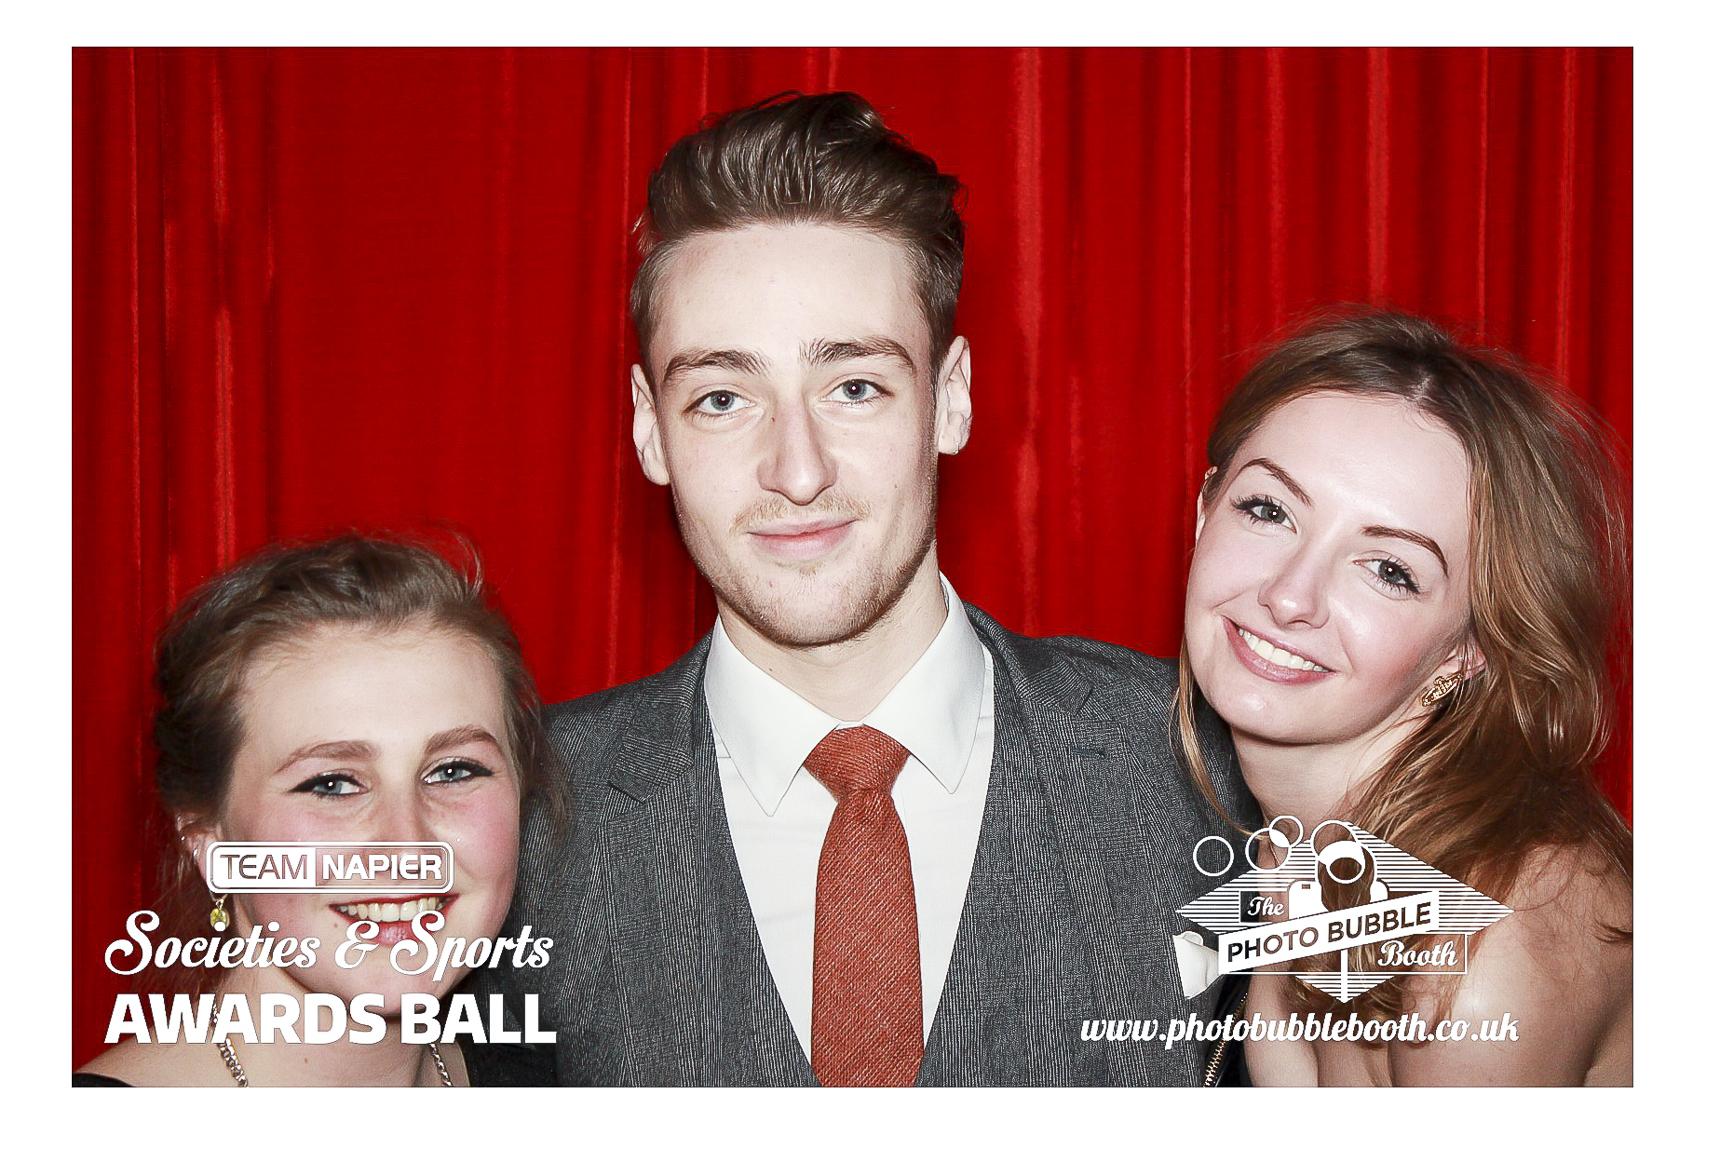 Napier Societies & Sports Awards_3.JPG